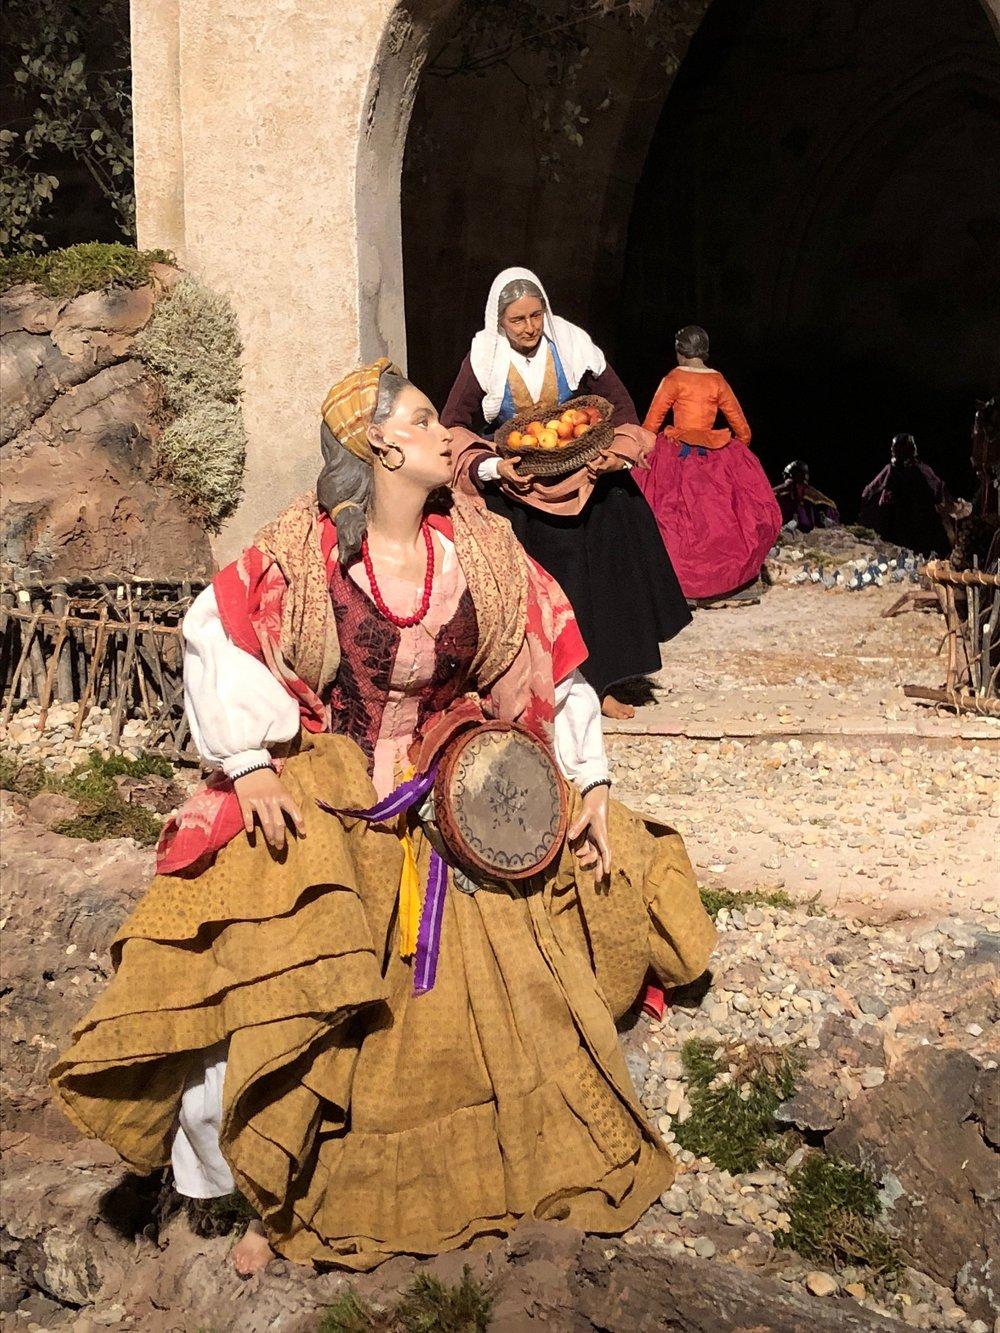 Women of the village